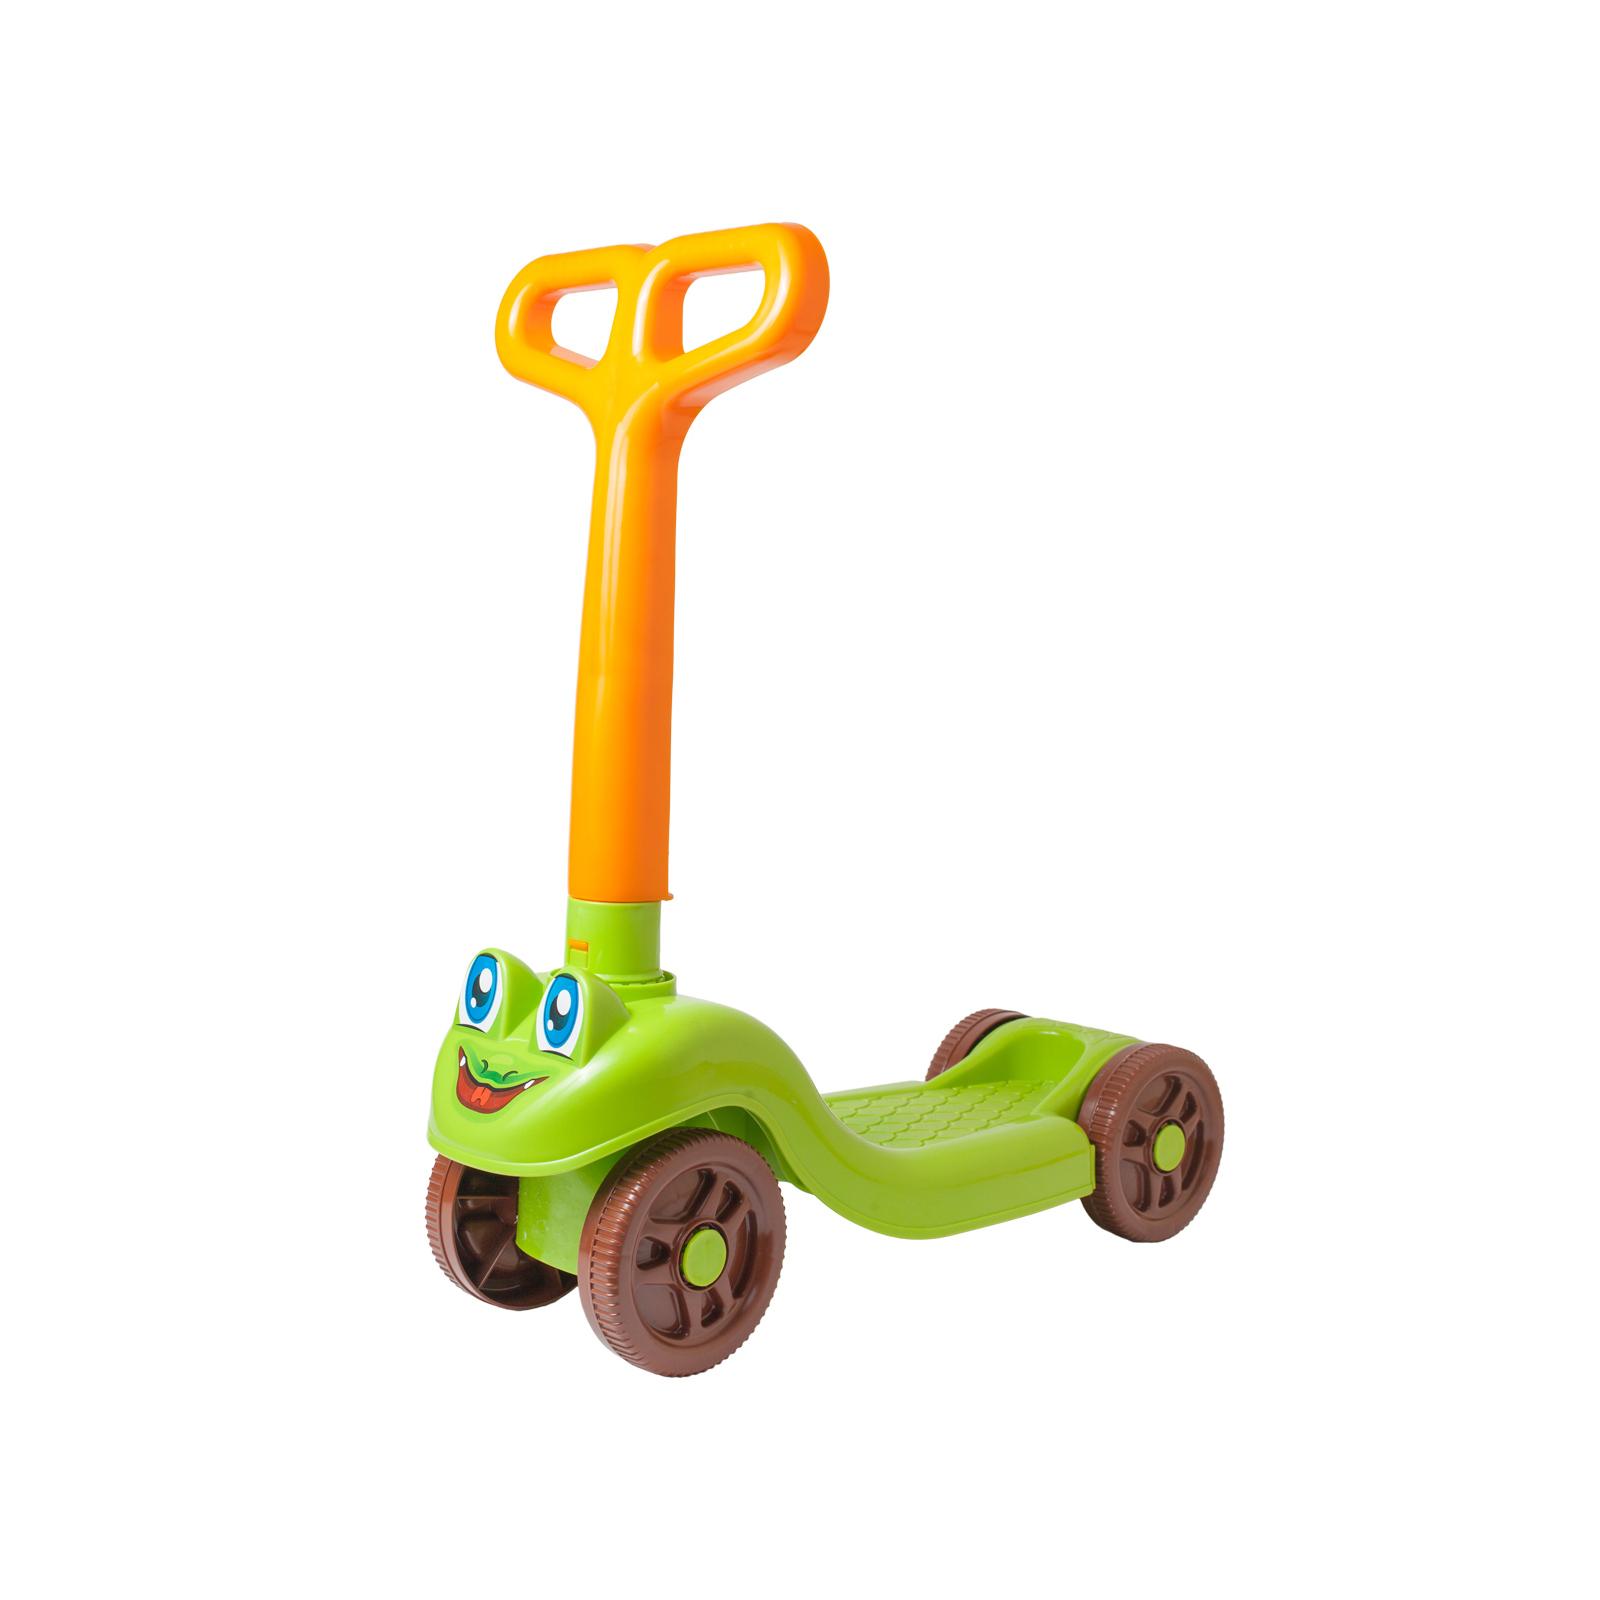 Скутер Технок Зеленый с желтым (3473)